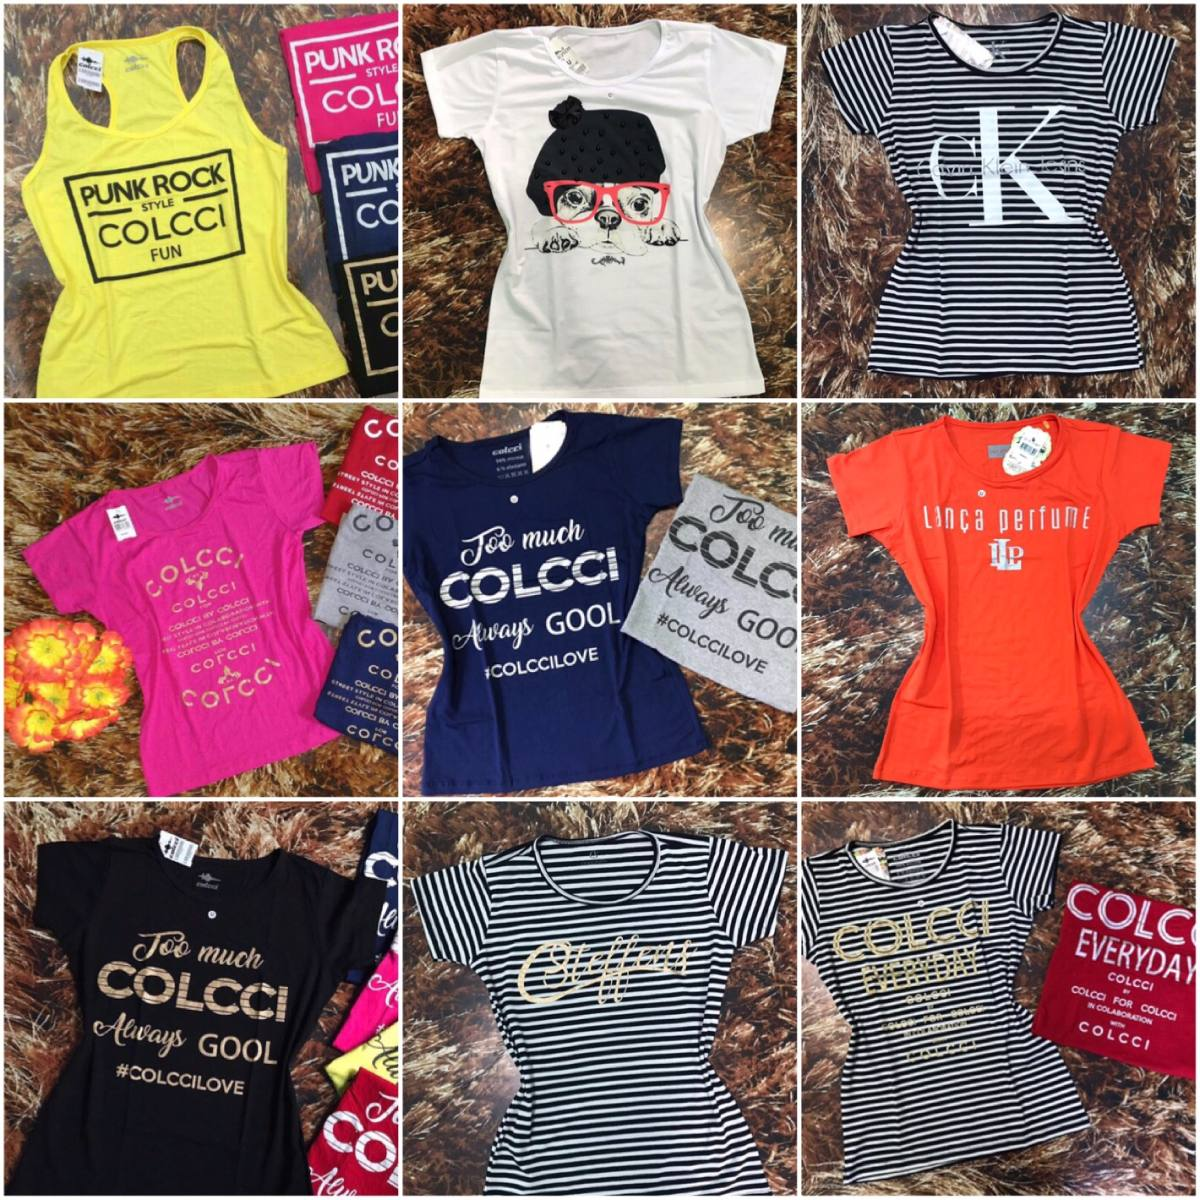 4bb80cbc3 Blusa Colcci Feminina T-shirt, Regata E Camiseta - R$ 35,00 em ...